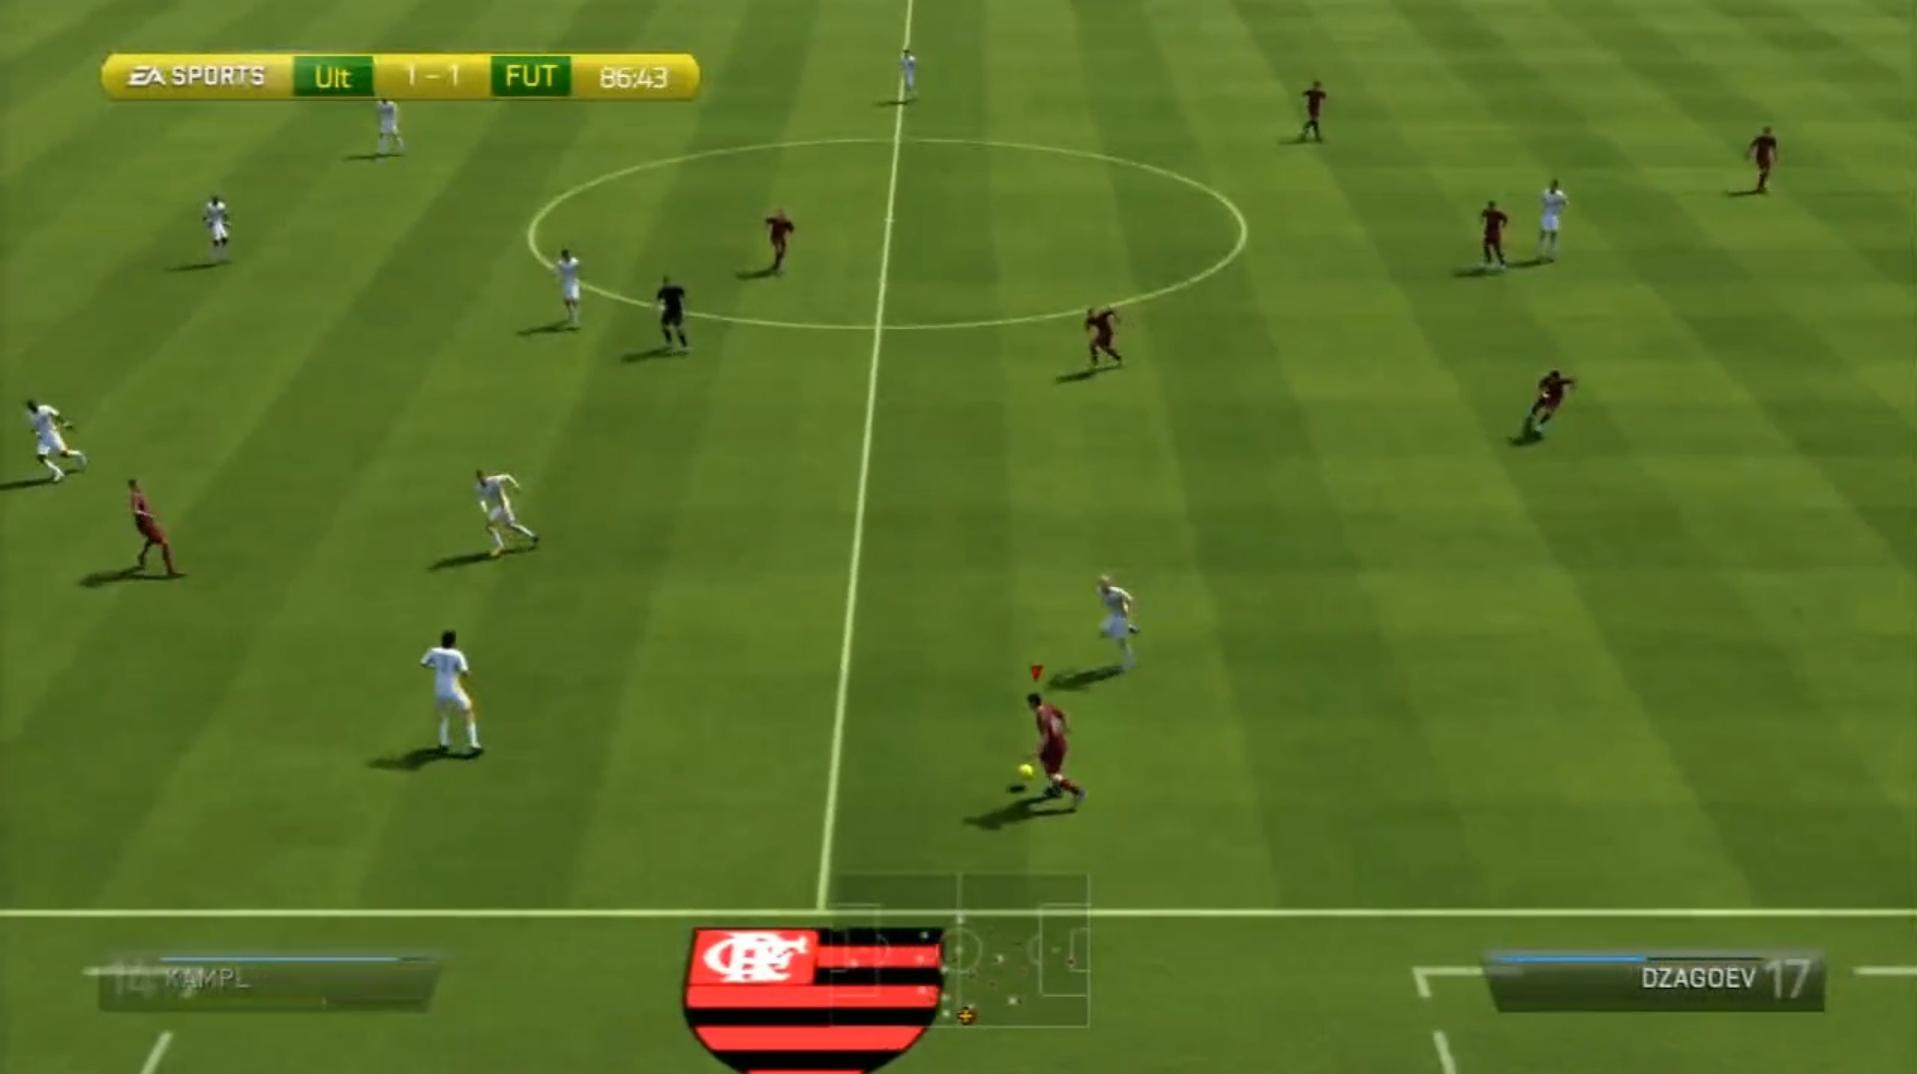 No Talk No Life: What we think about FIFA 14 | No Game No Talk